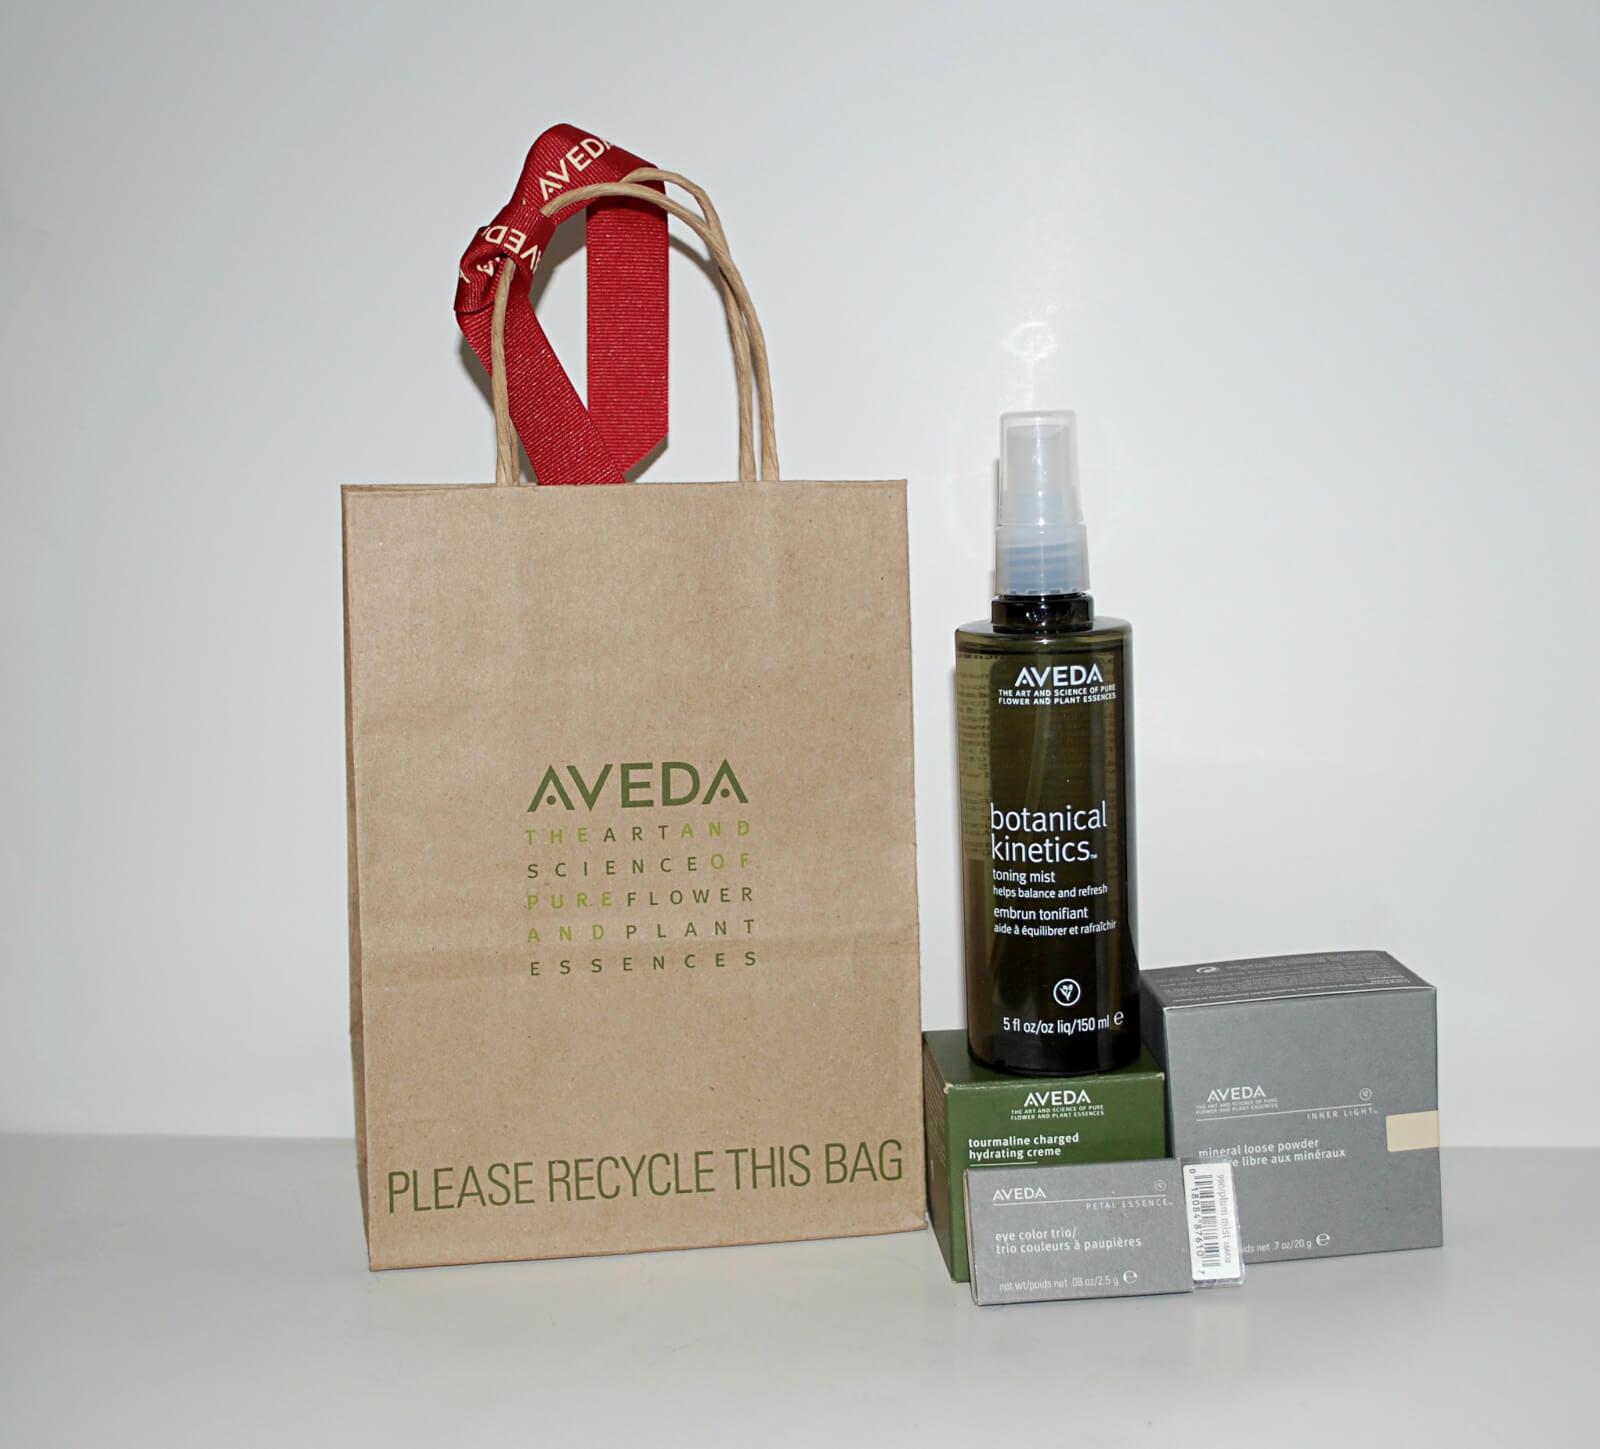 Veda products, aveda winnipeg, aveda skin cream products